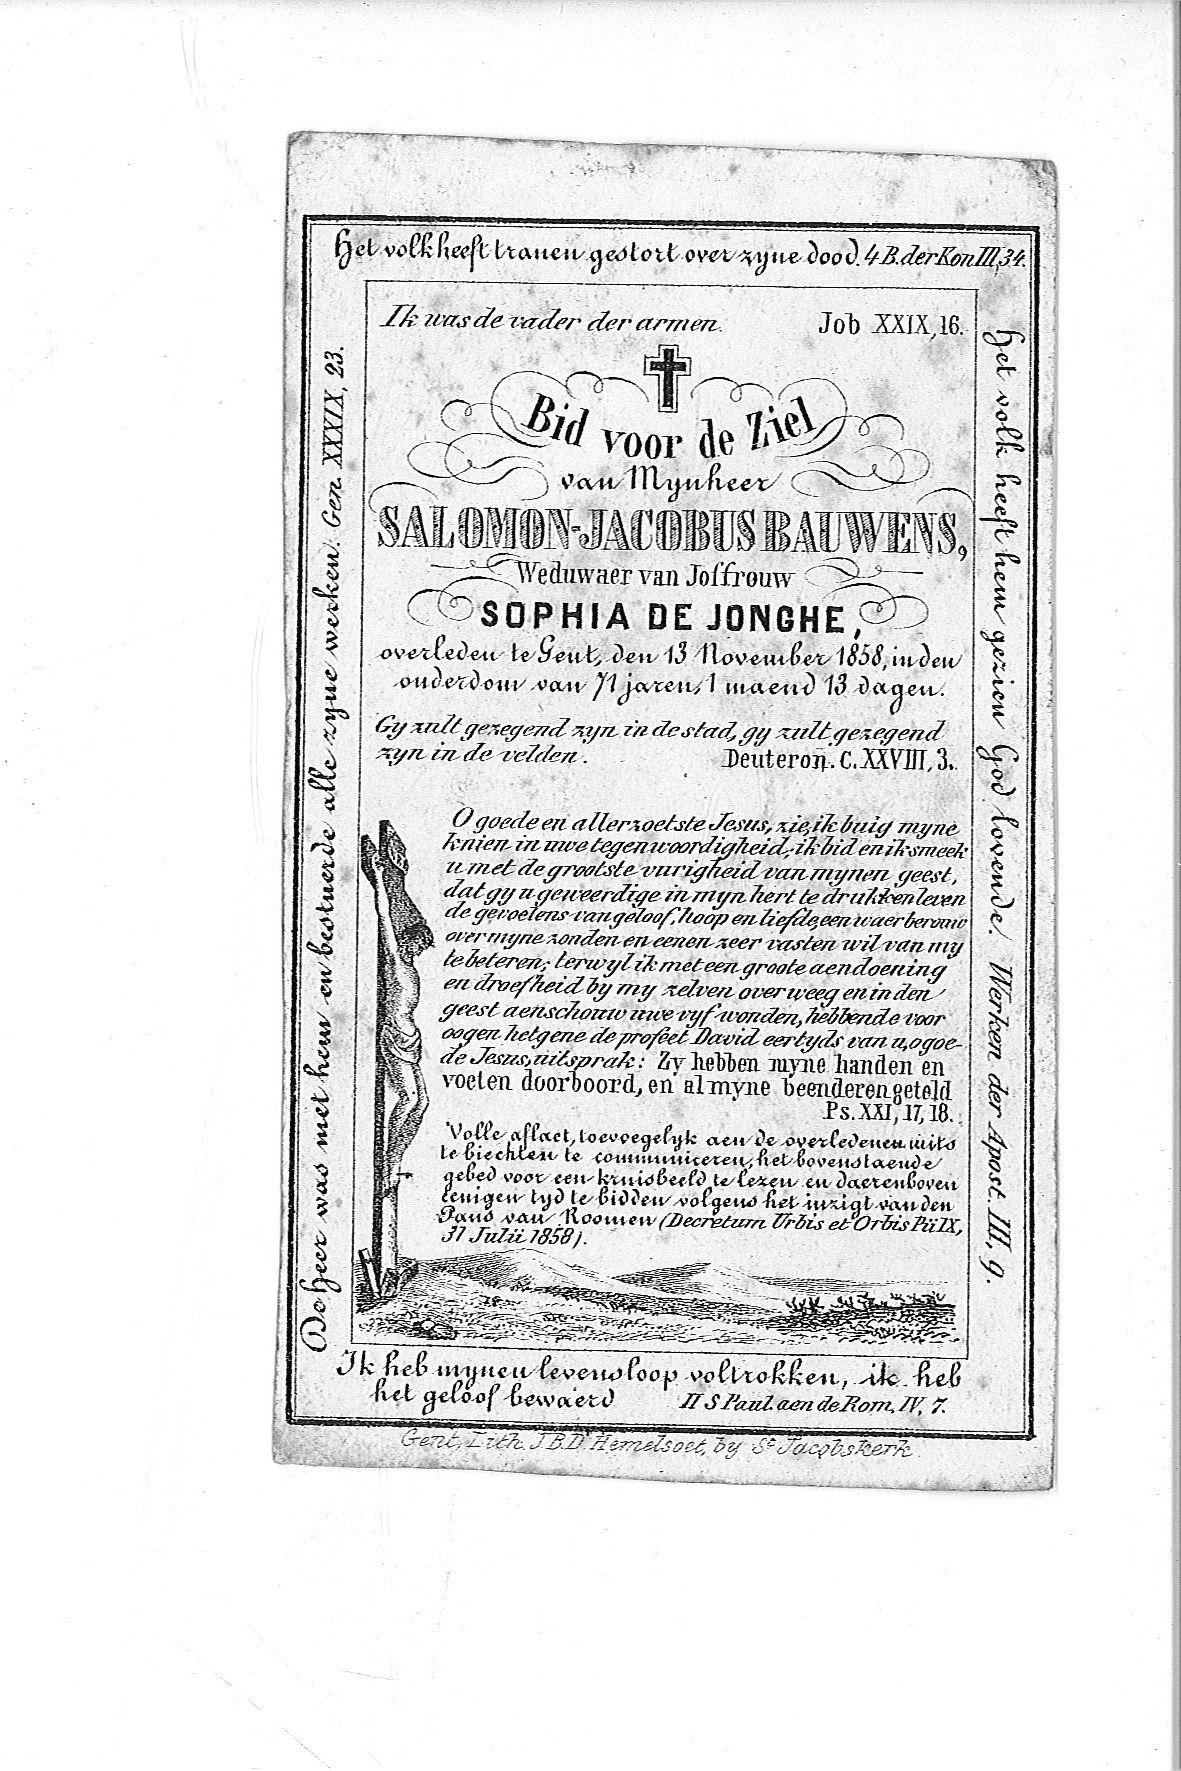 salomon-jacobus(1859)20090723110044_00031.jpg